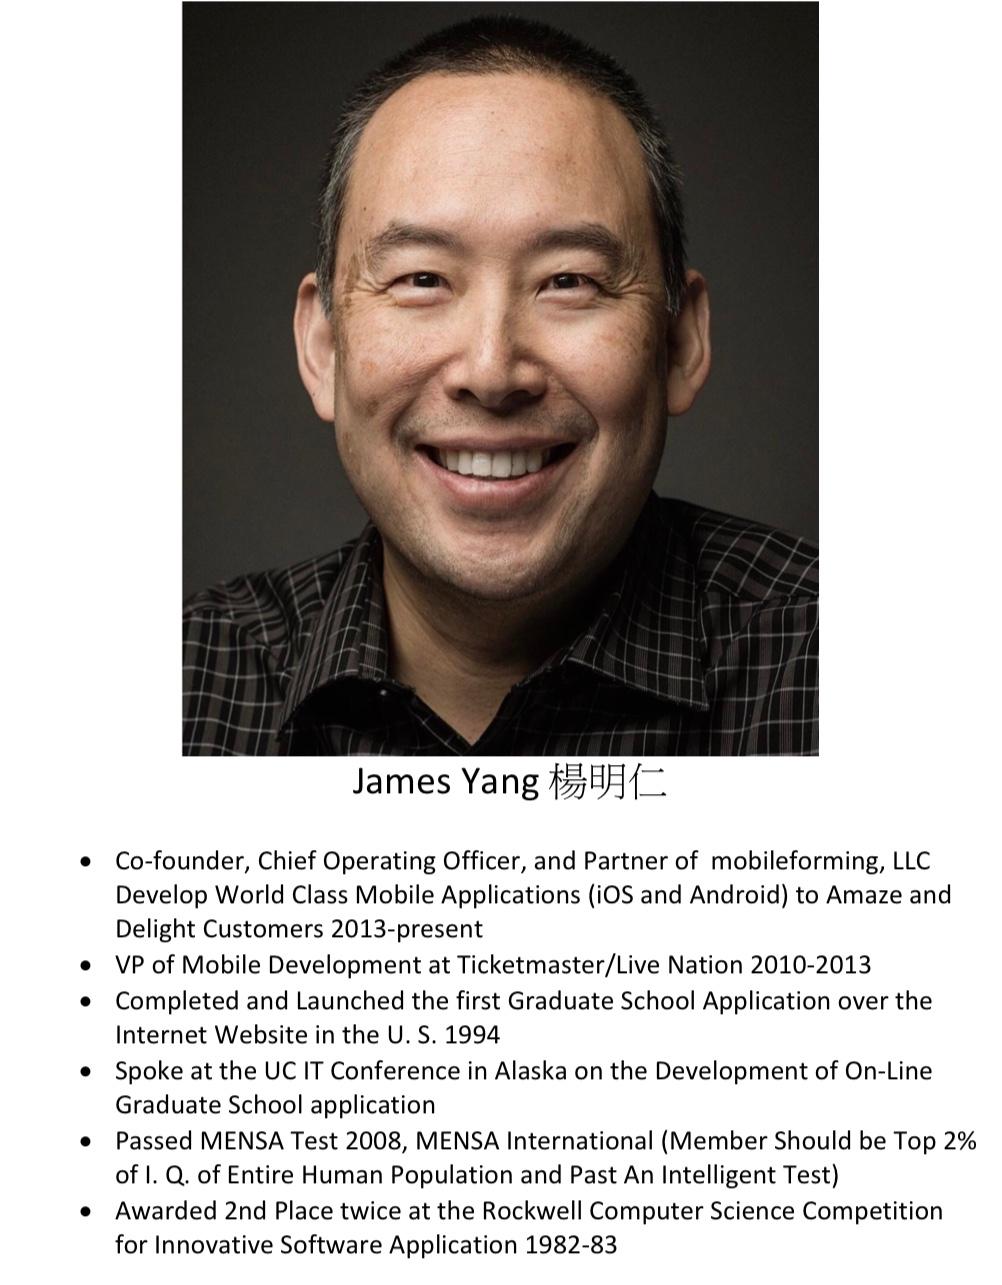 284. James Yang 楊明仁